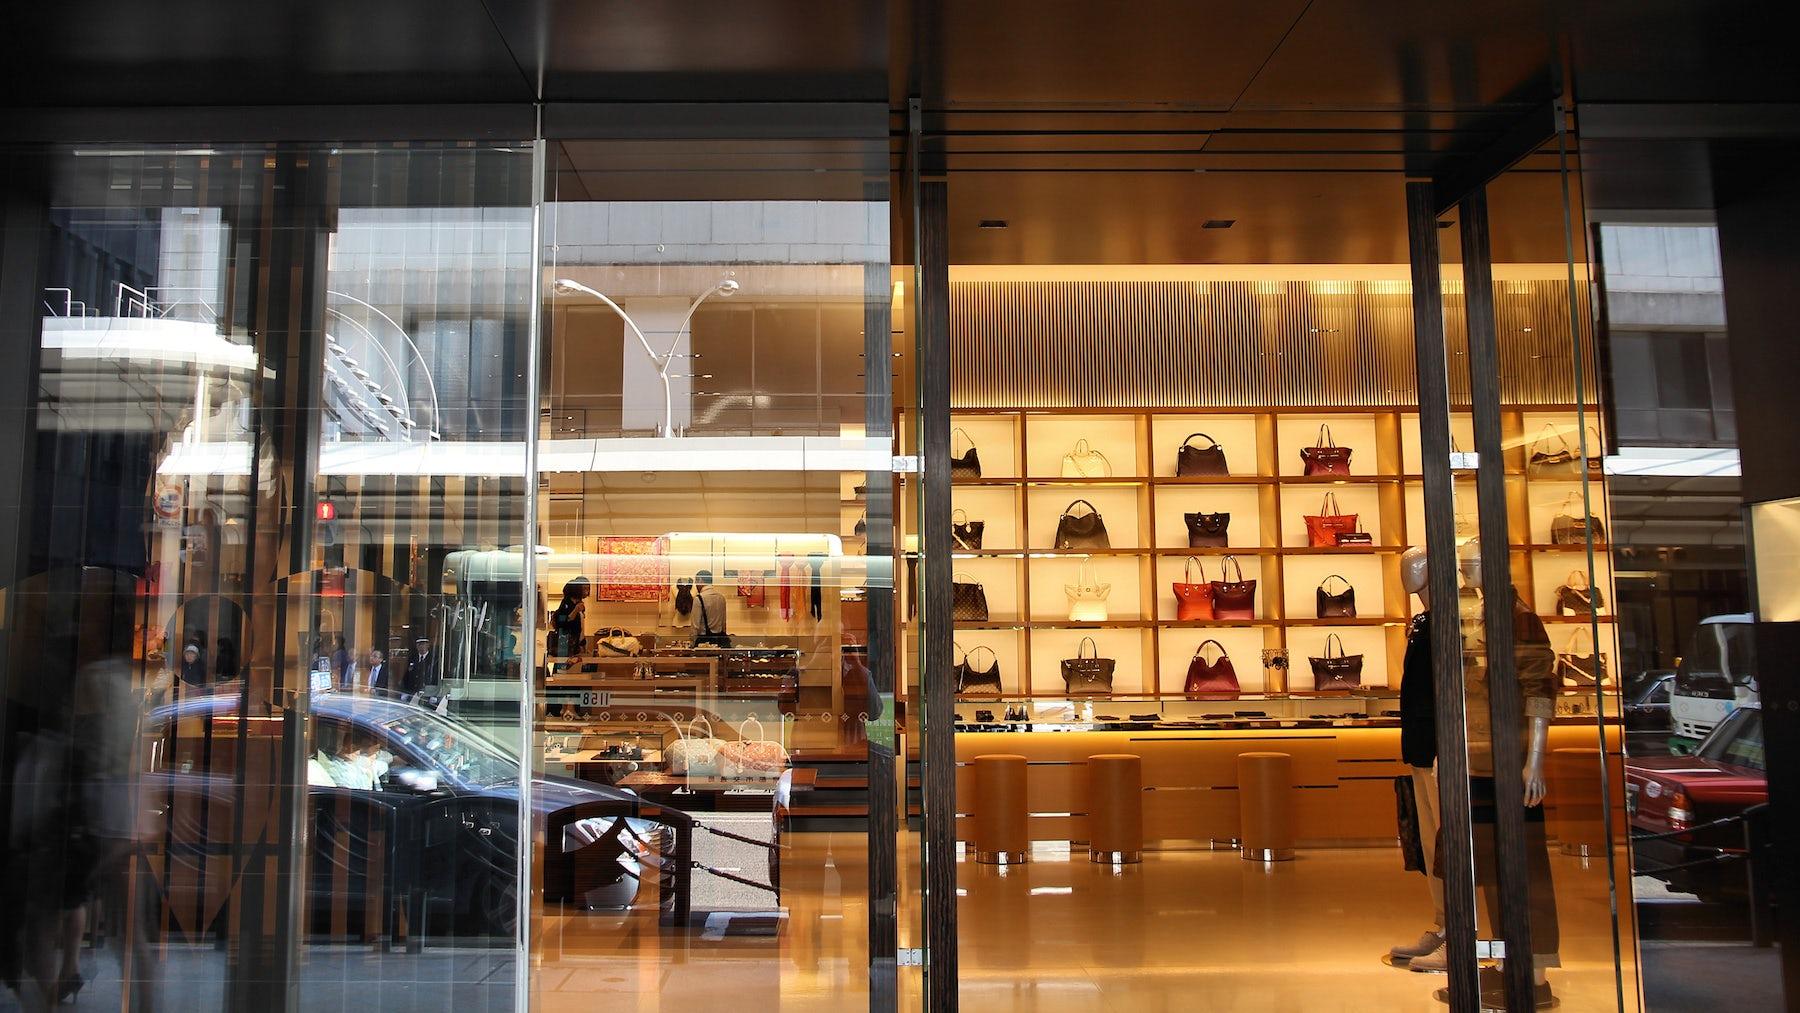 Louis Vuitton store | Source: Shutterstock